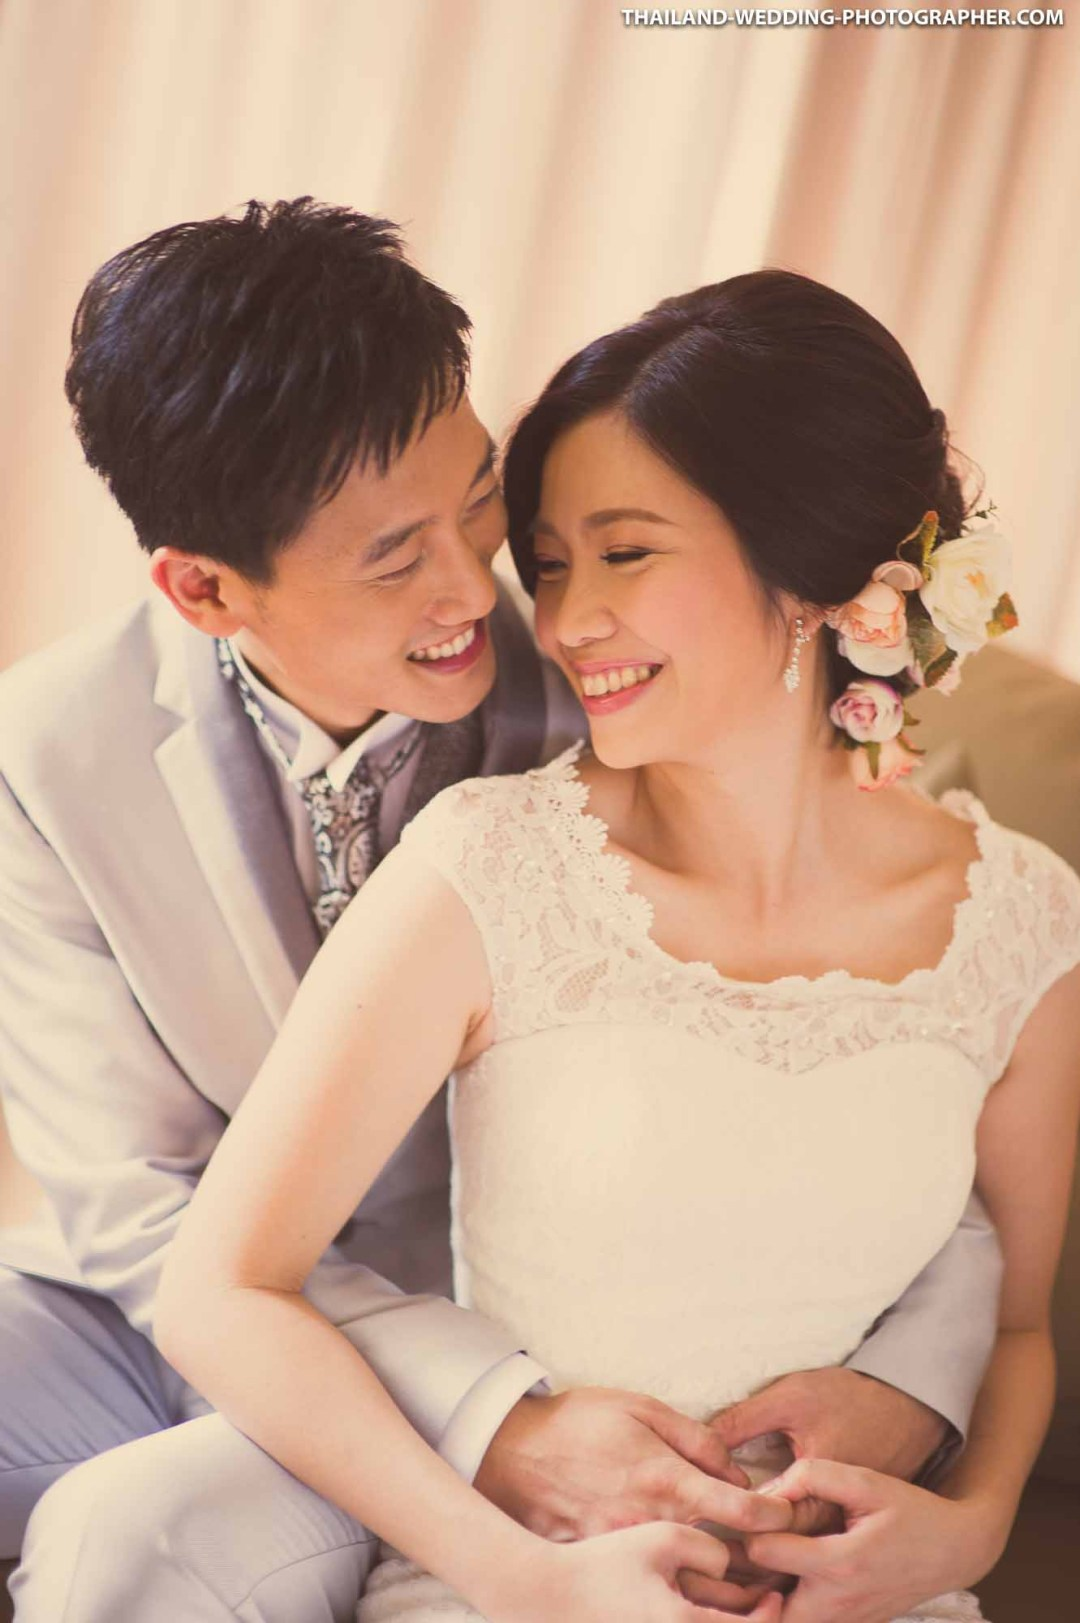 AKA Resort & Spa Hua Hin Thailand Wedding Photography